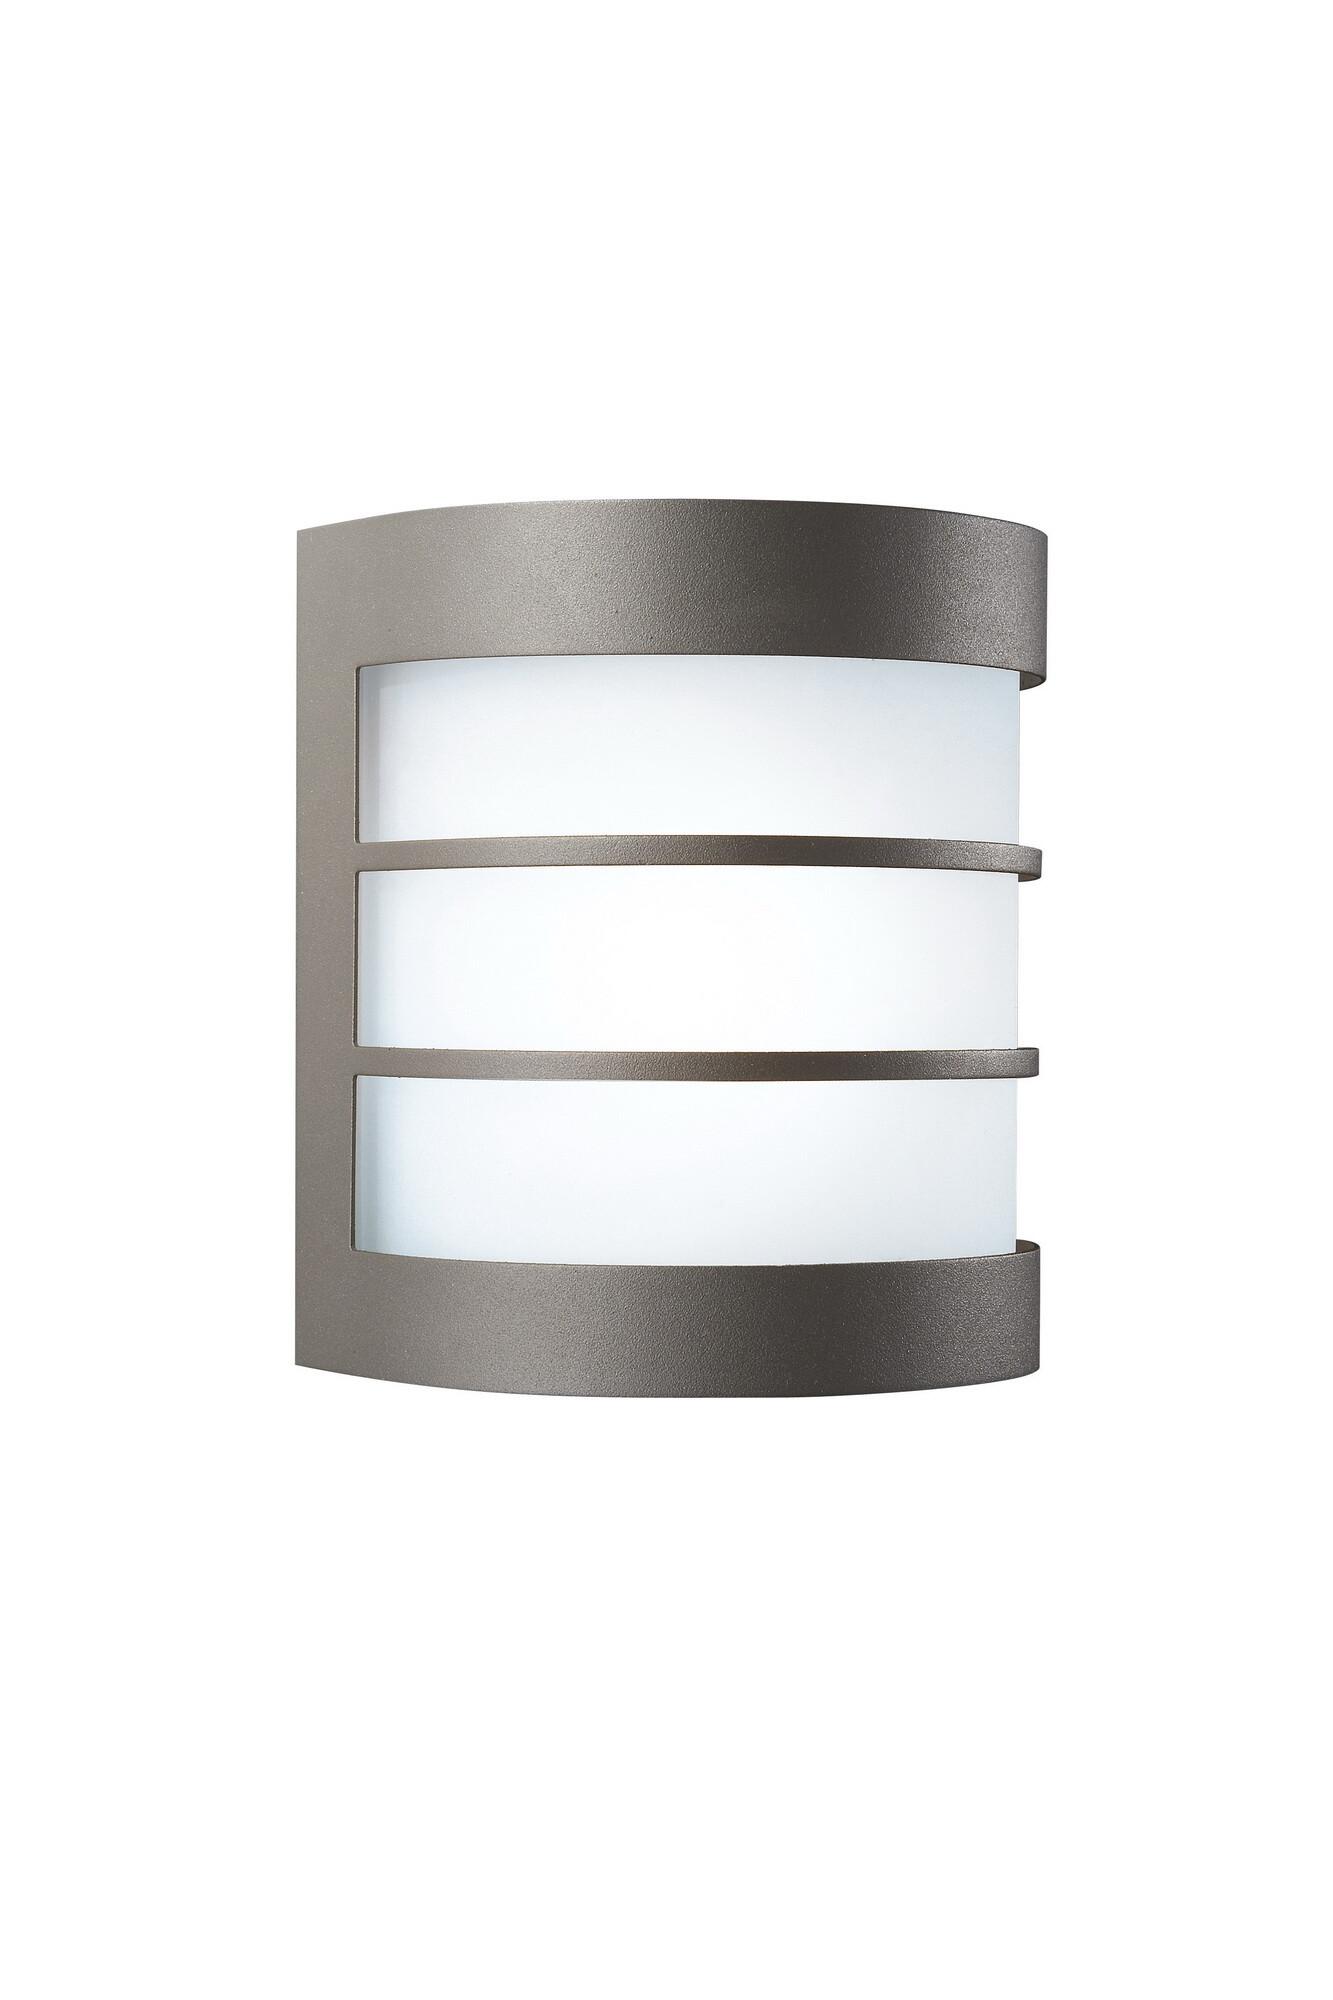 Philips CALGARY Wandlamp E27 1x8W Lichtgrijs